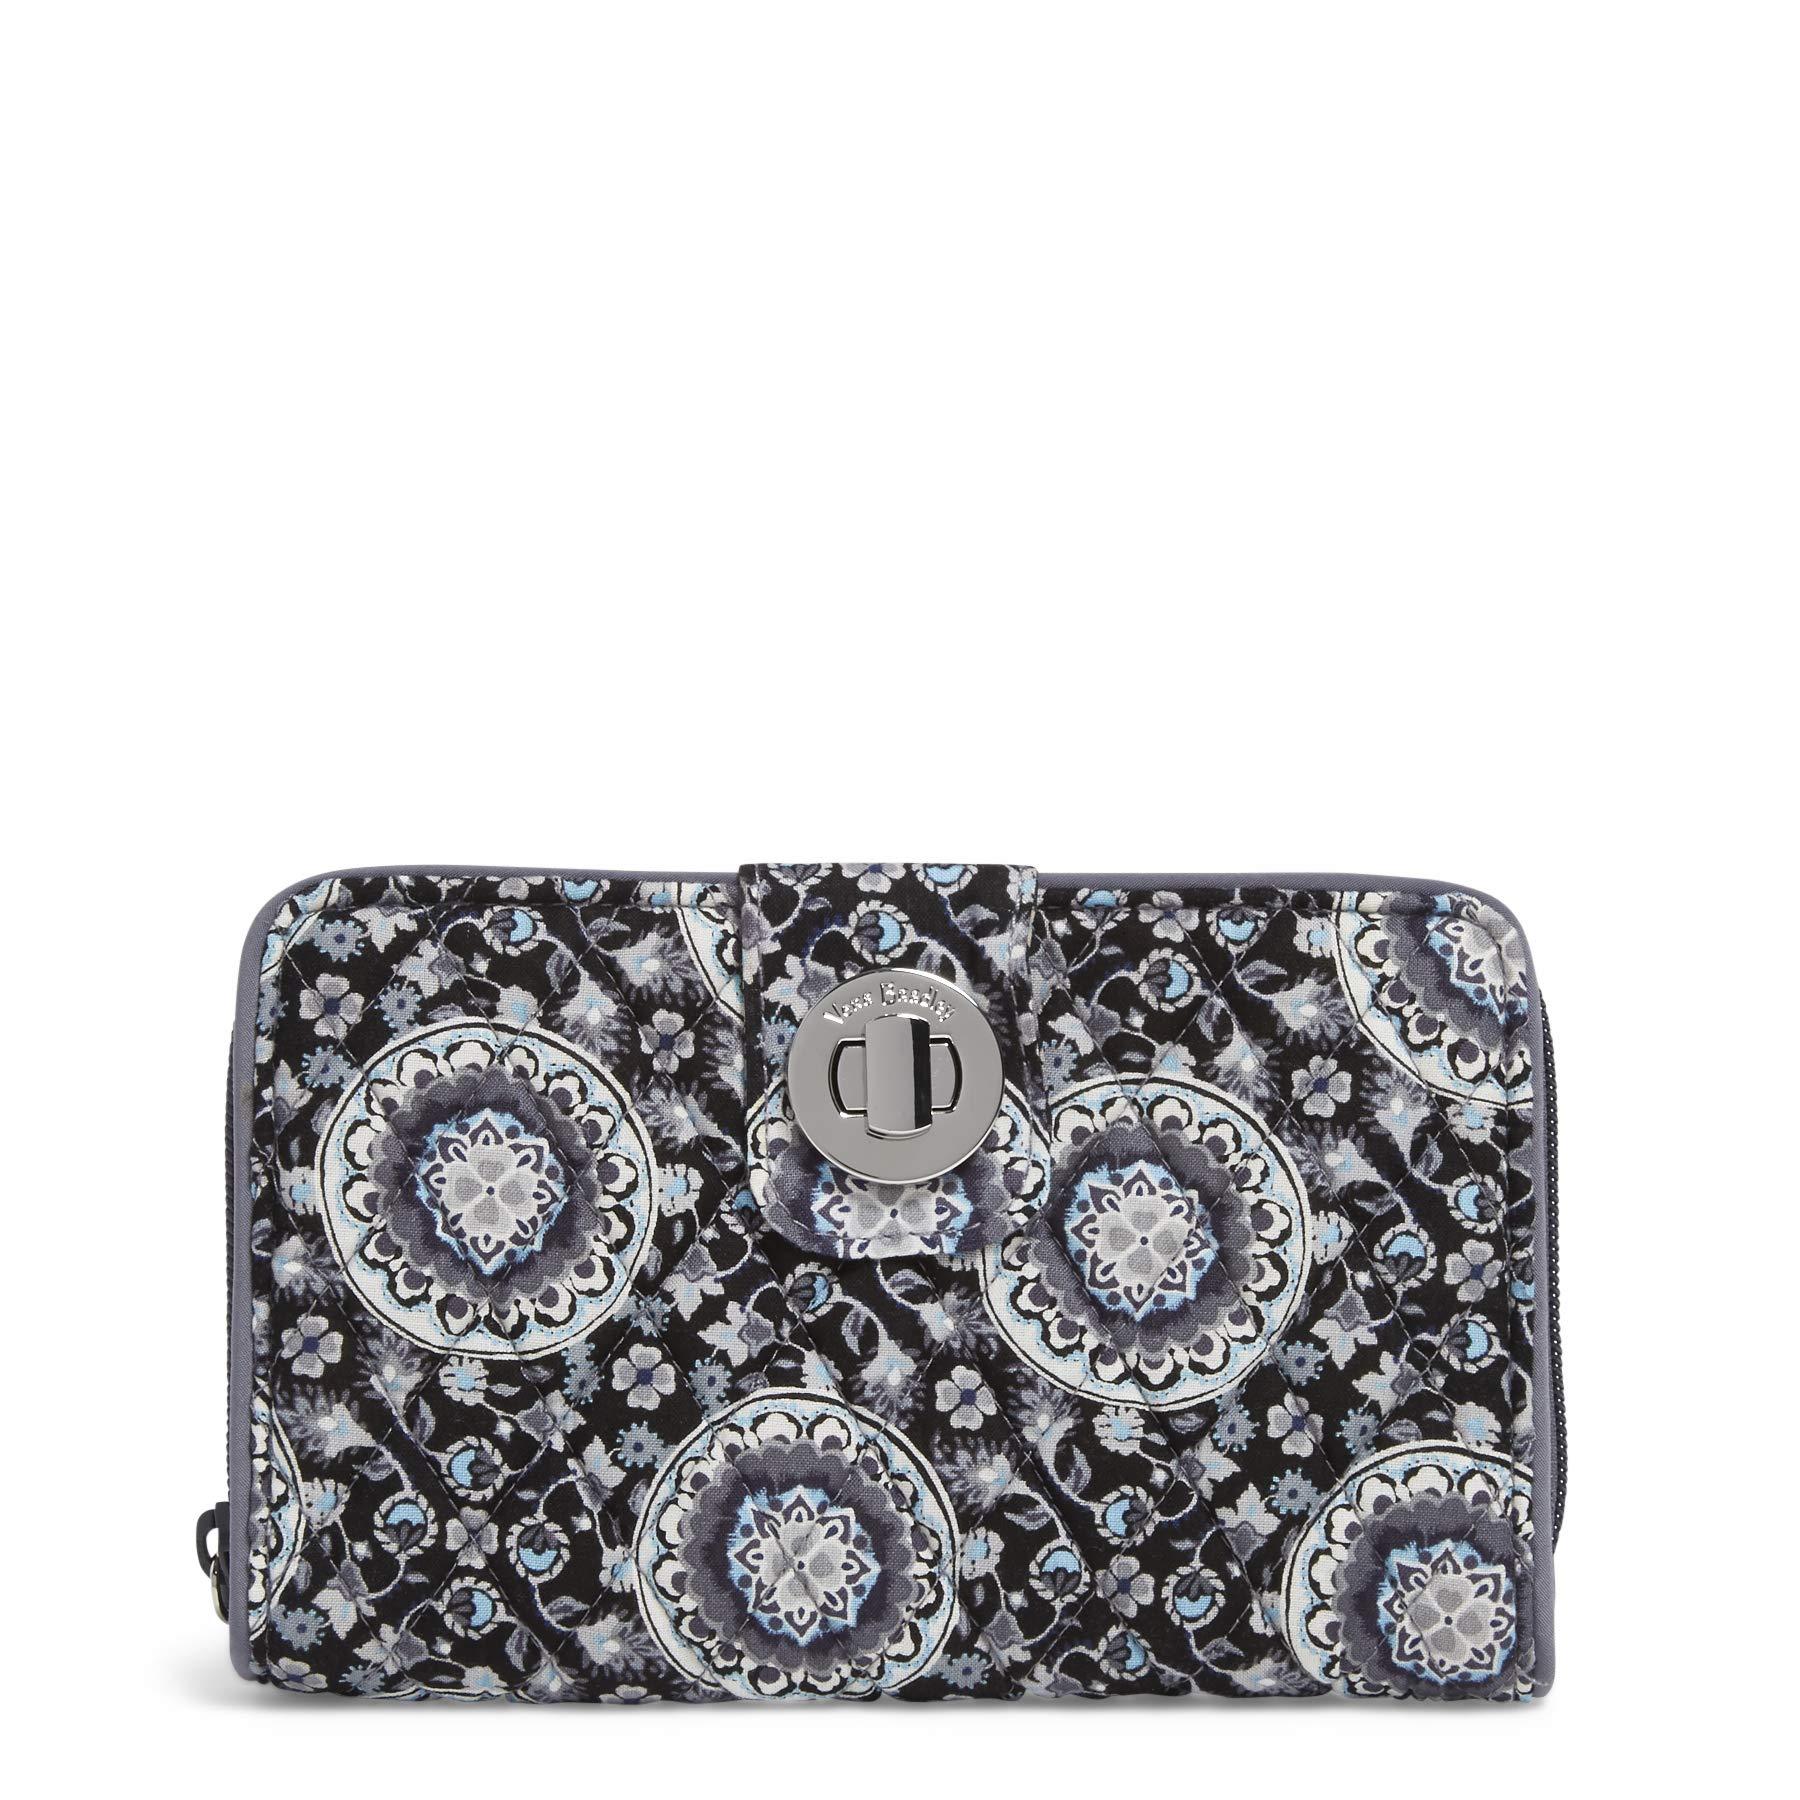 Vera Bradley RFID Turnlock Wallet, Signature Cotton, Charcoal Medallion by Vera Bradley (Image #1)